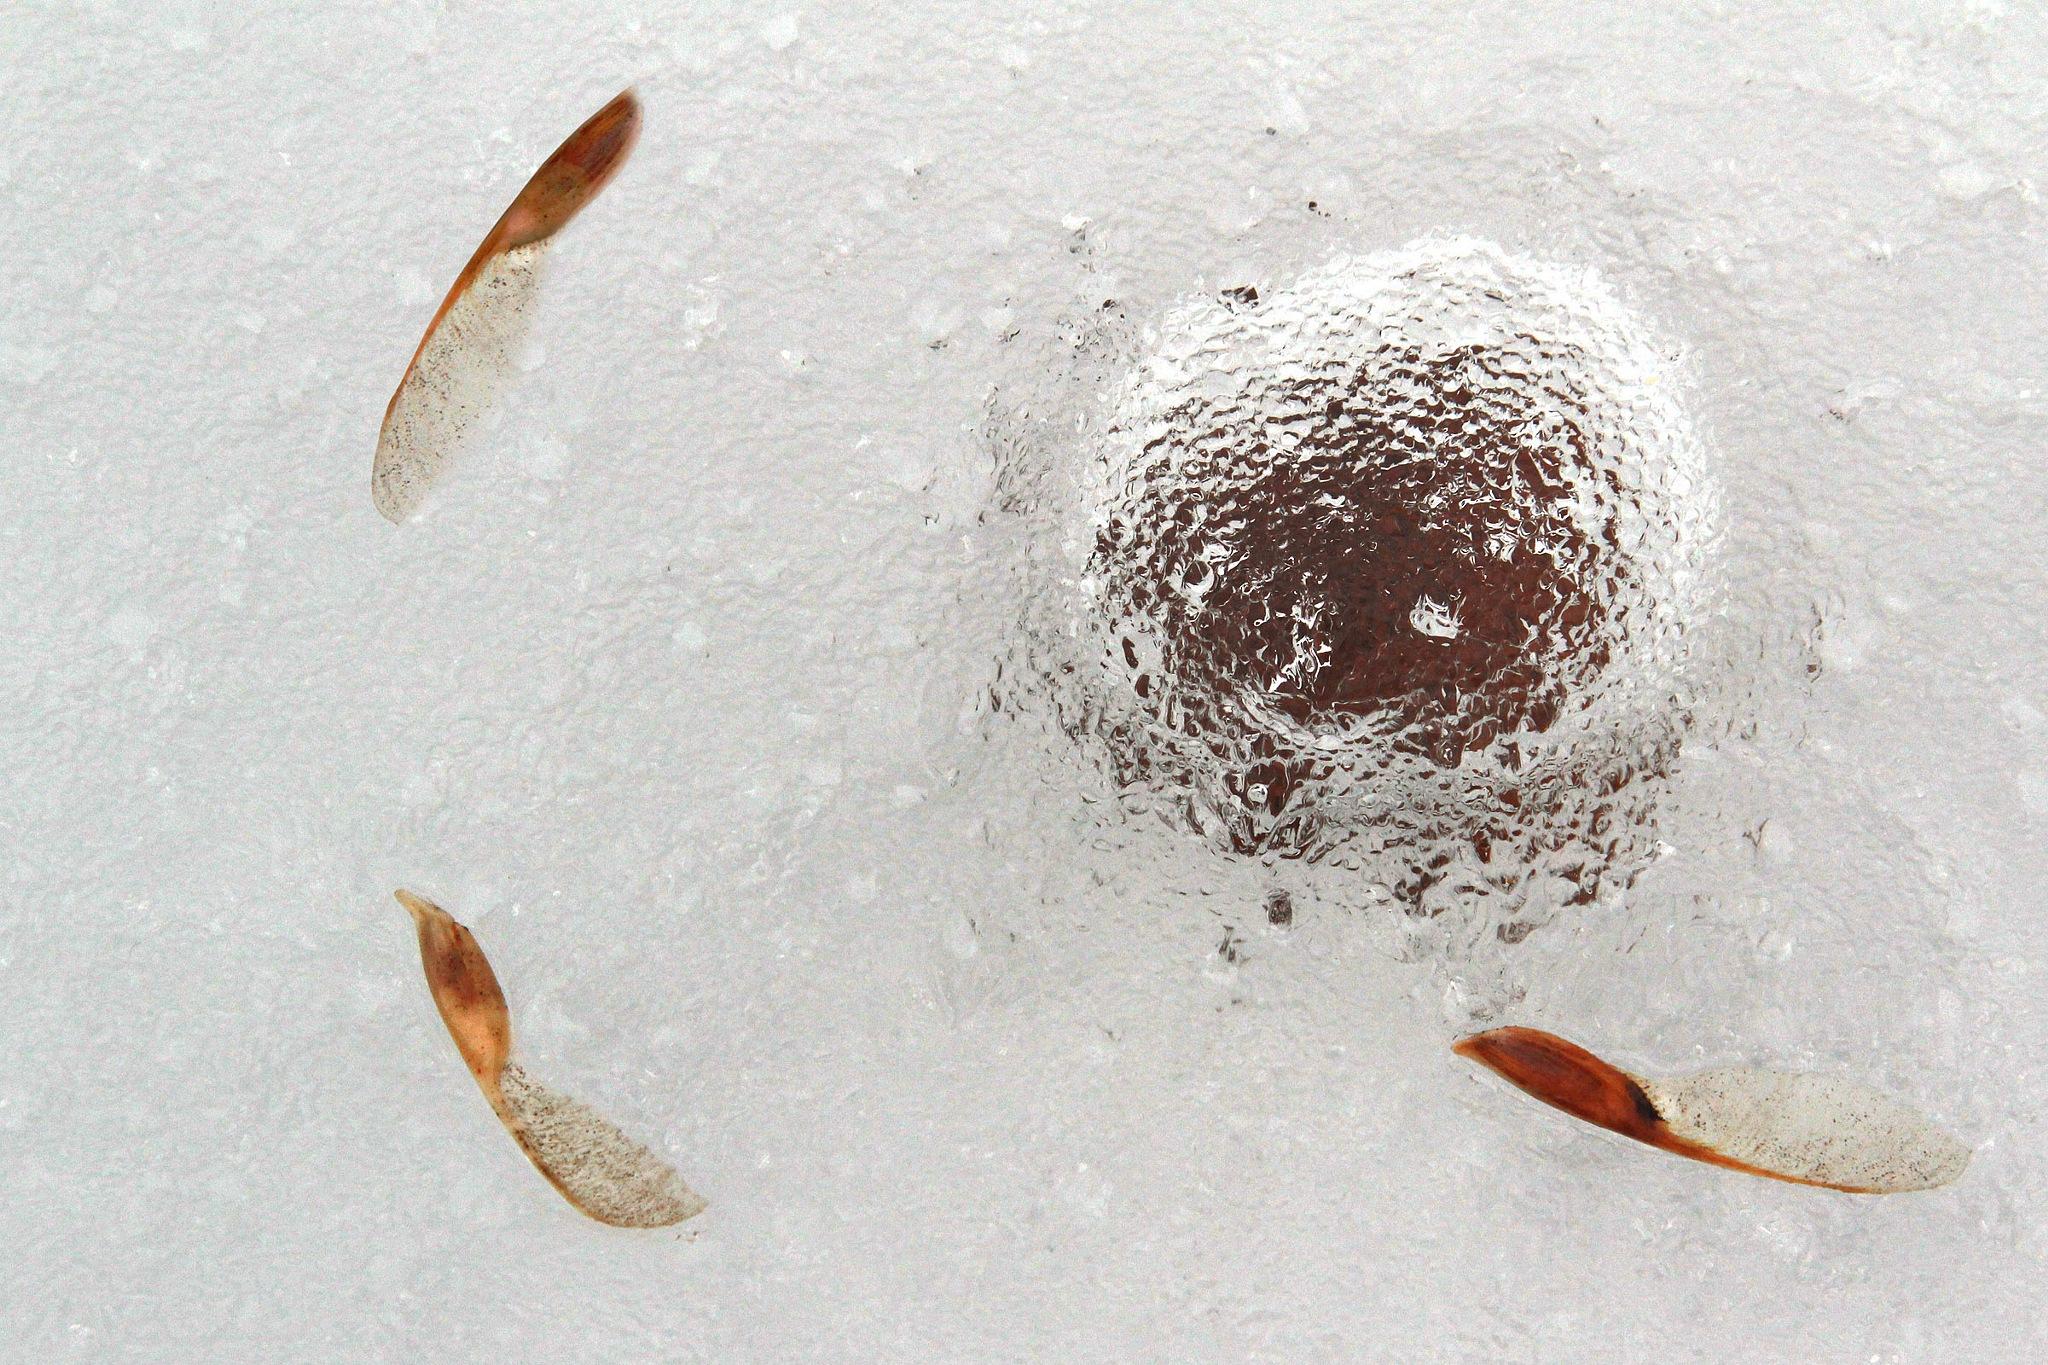 frozen leaf by Sladjan Tasic